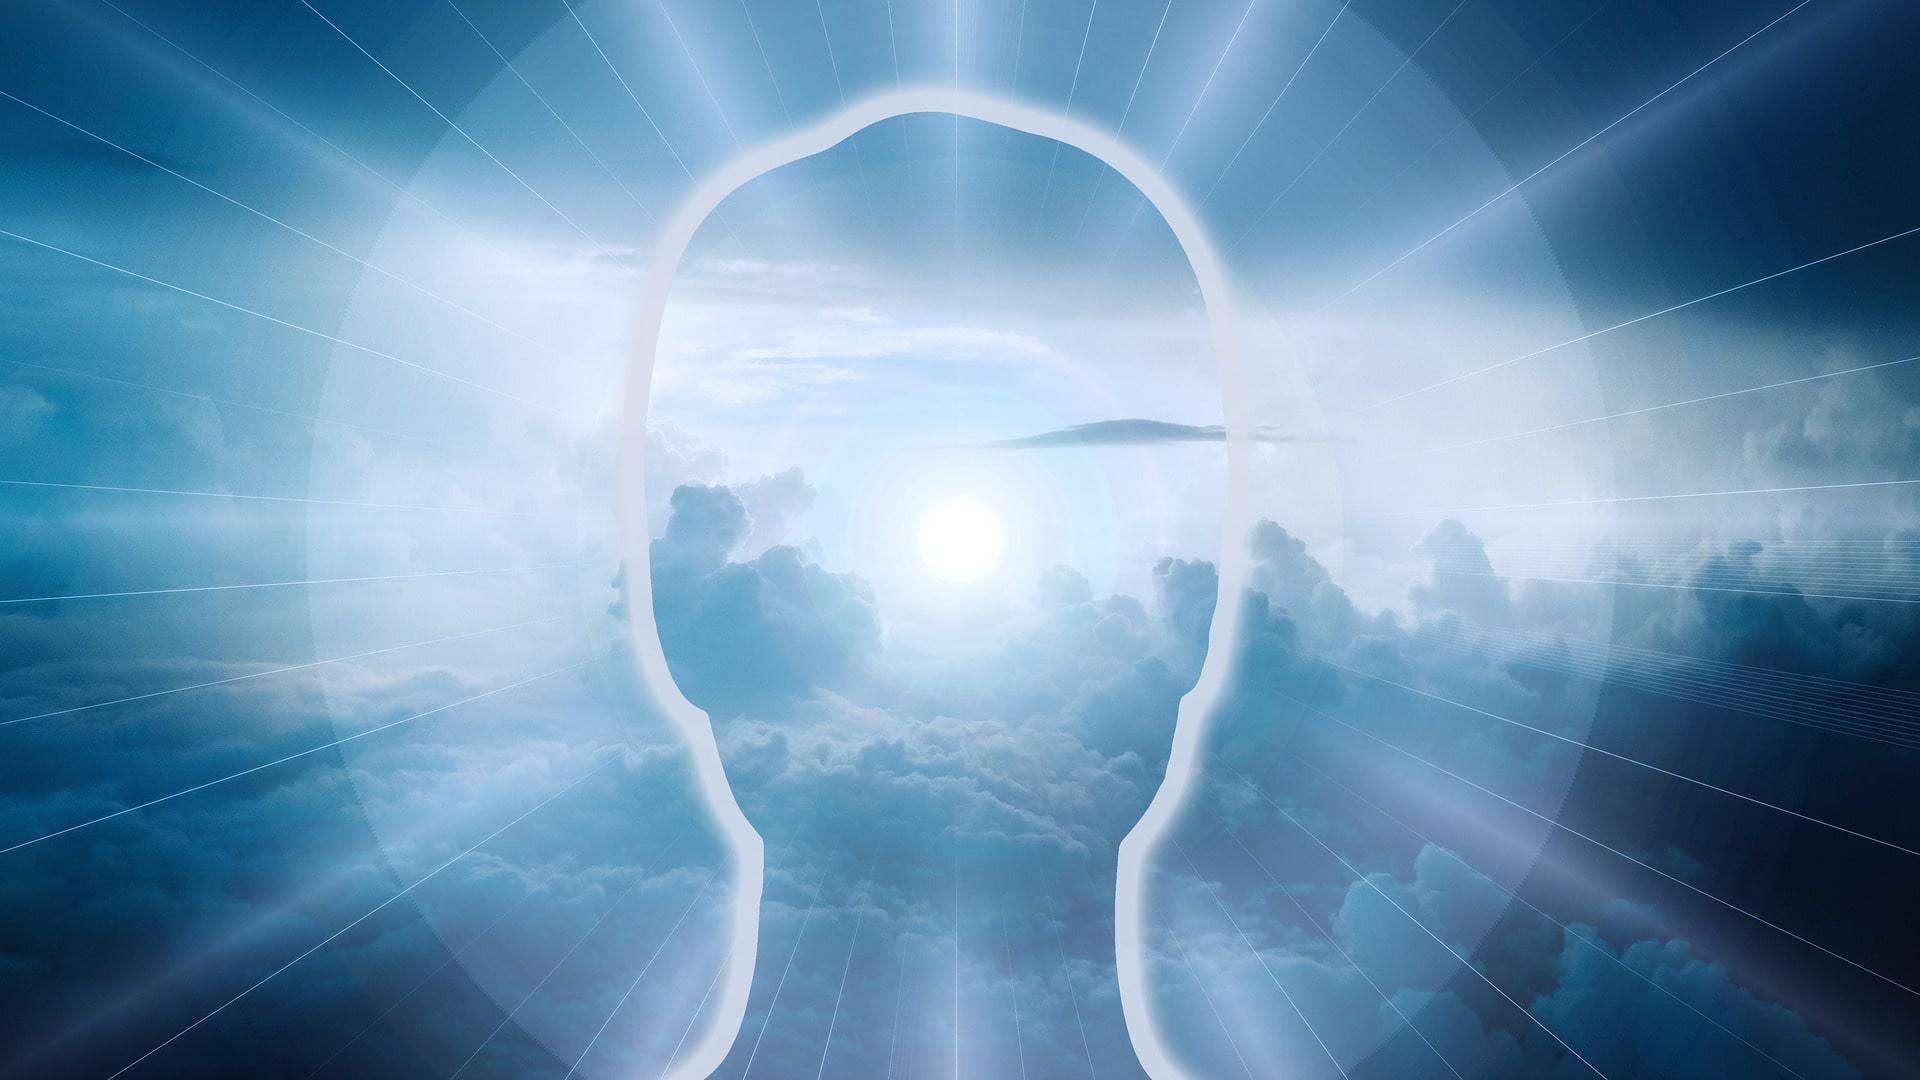 Психология как наука указывает на Творца